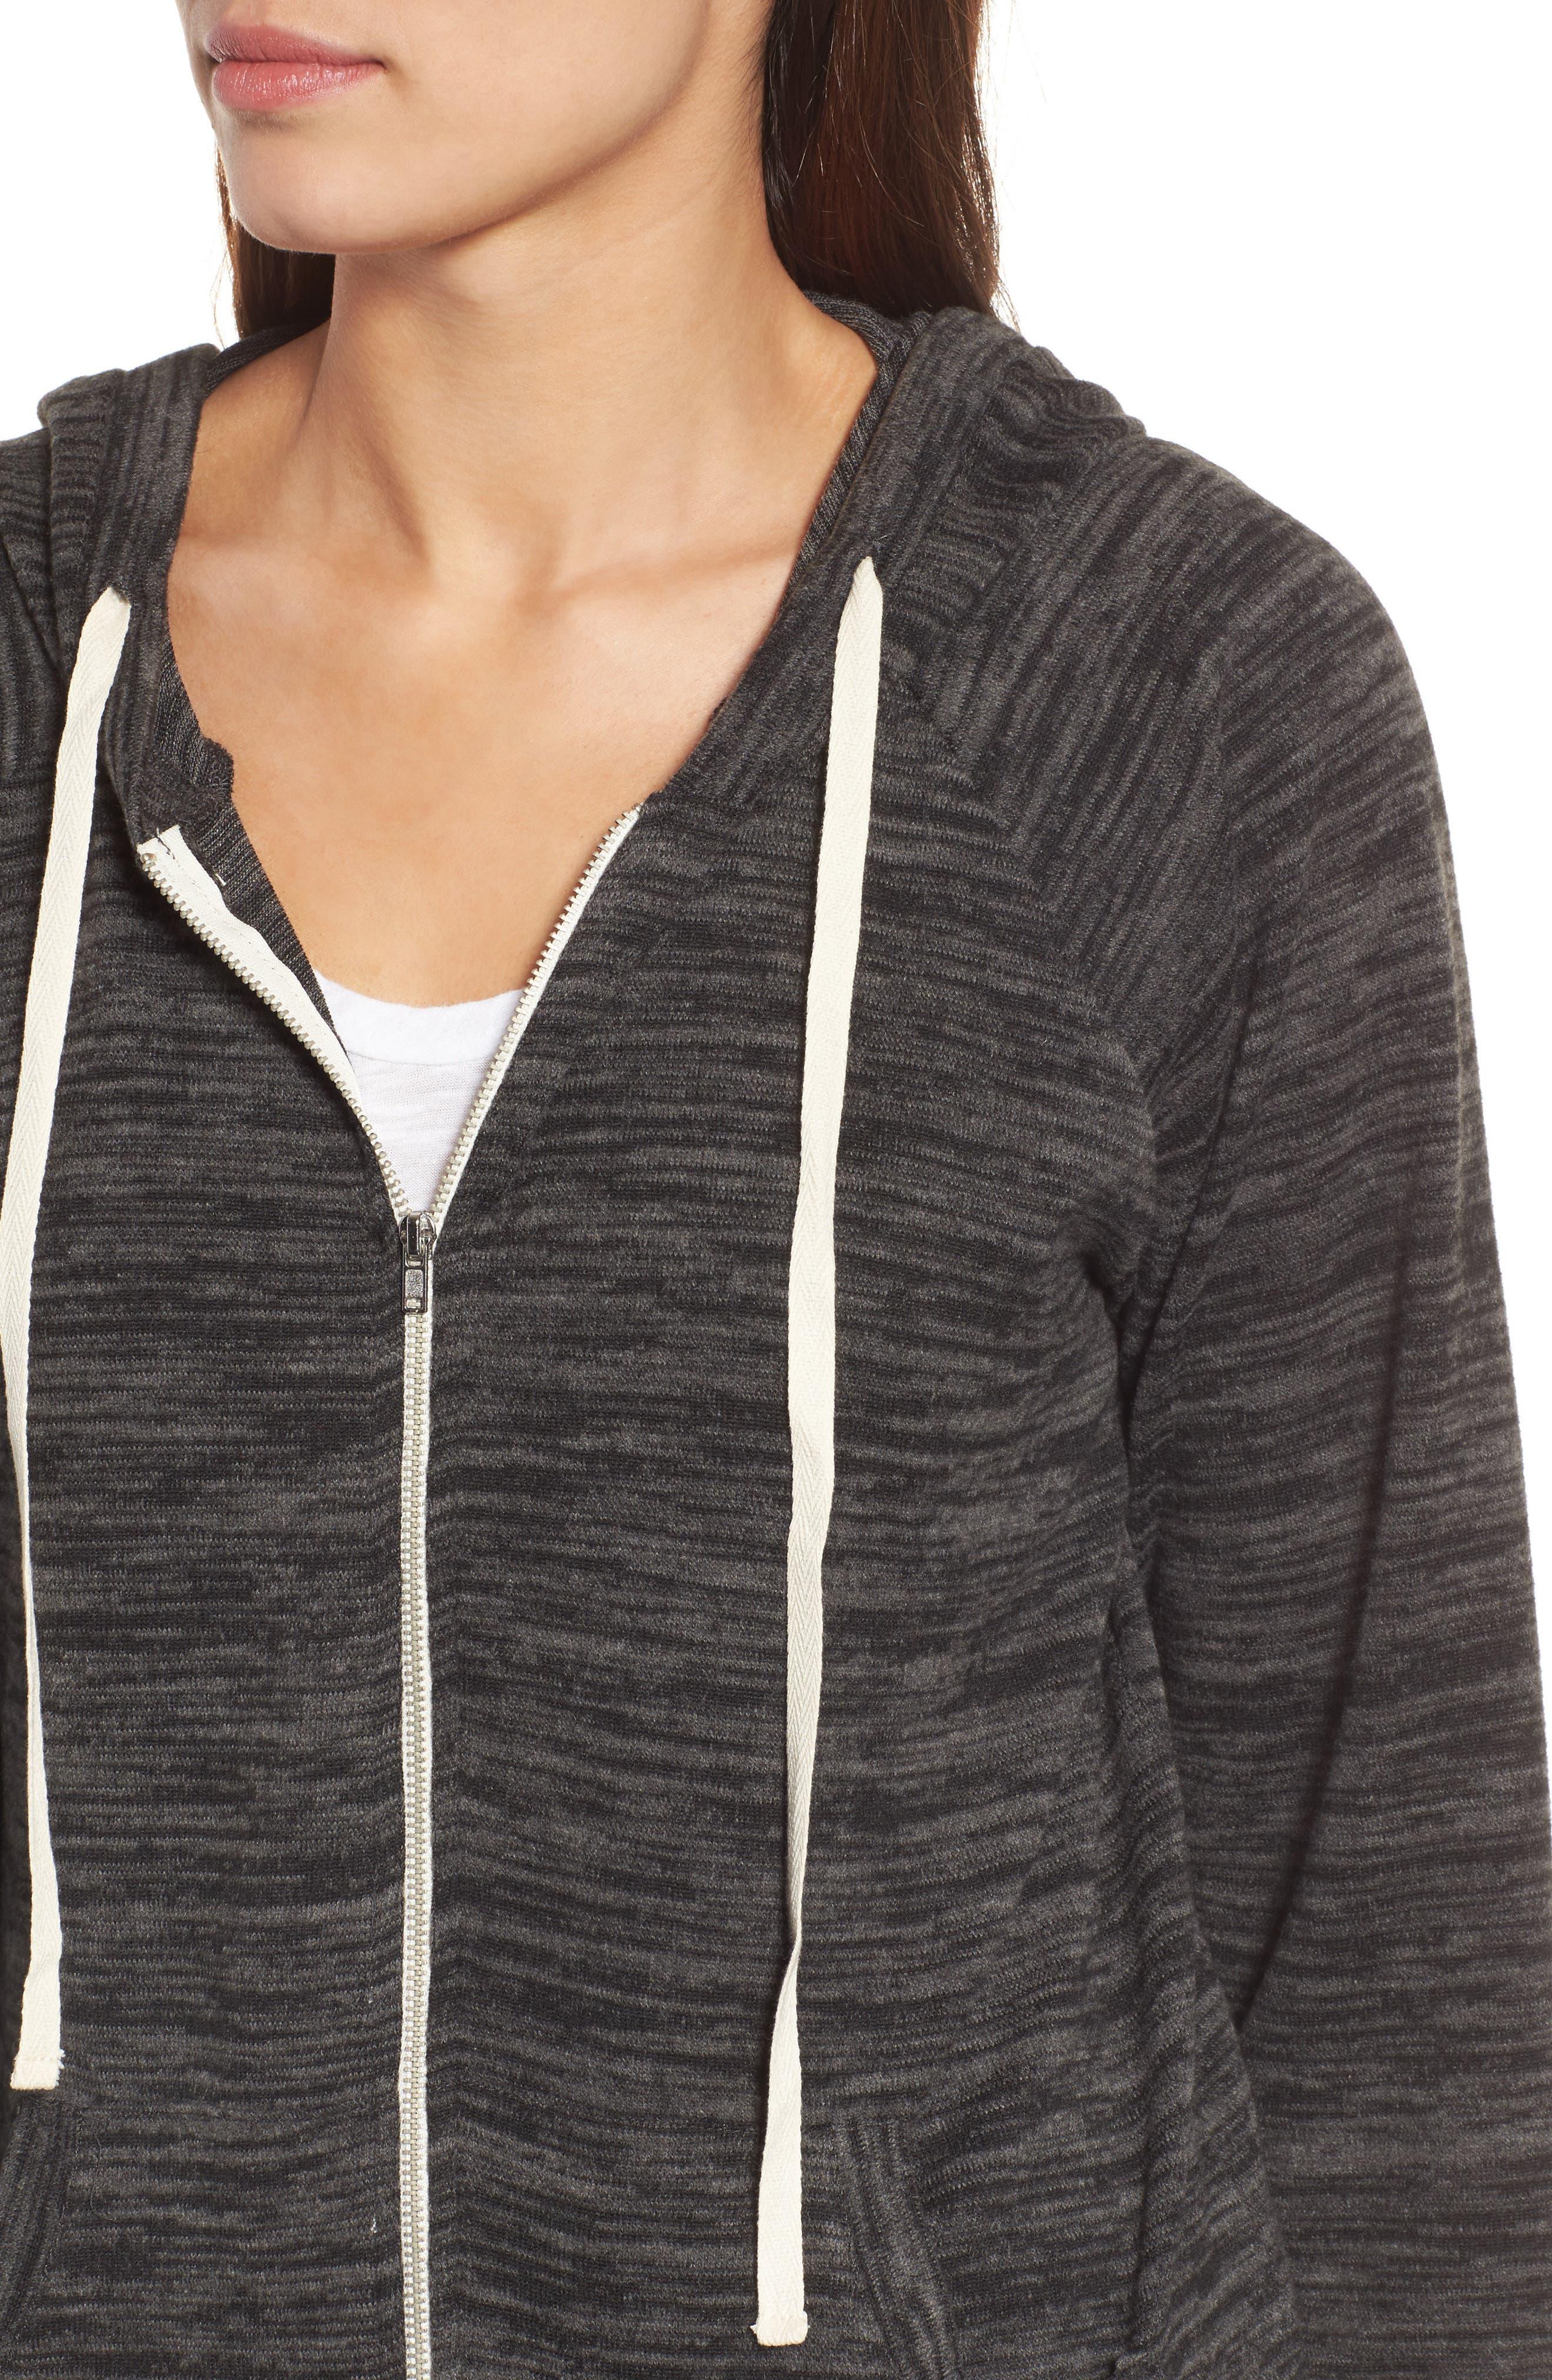 Zip Front Hoodie,                             Alternate thumbnail 4, color,                             Black